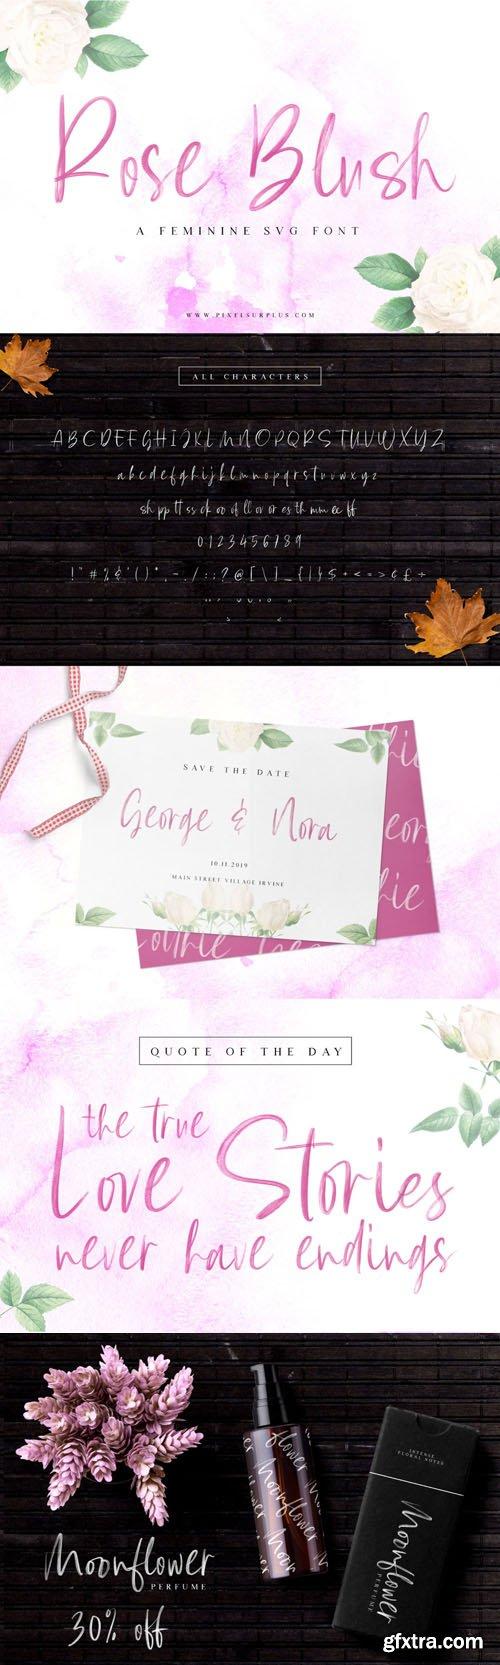 Rose Blush - A Feminine SVG Font